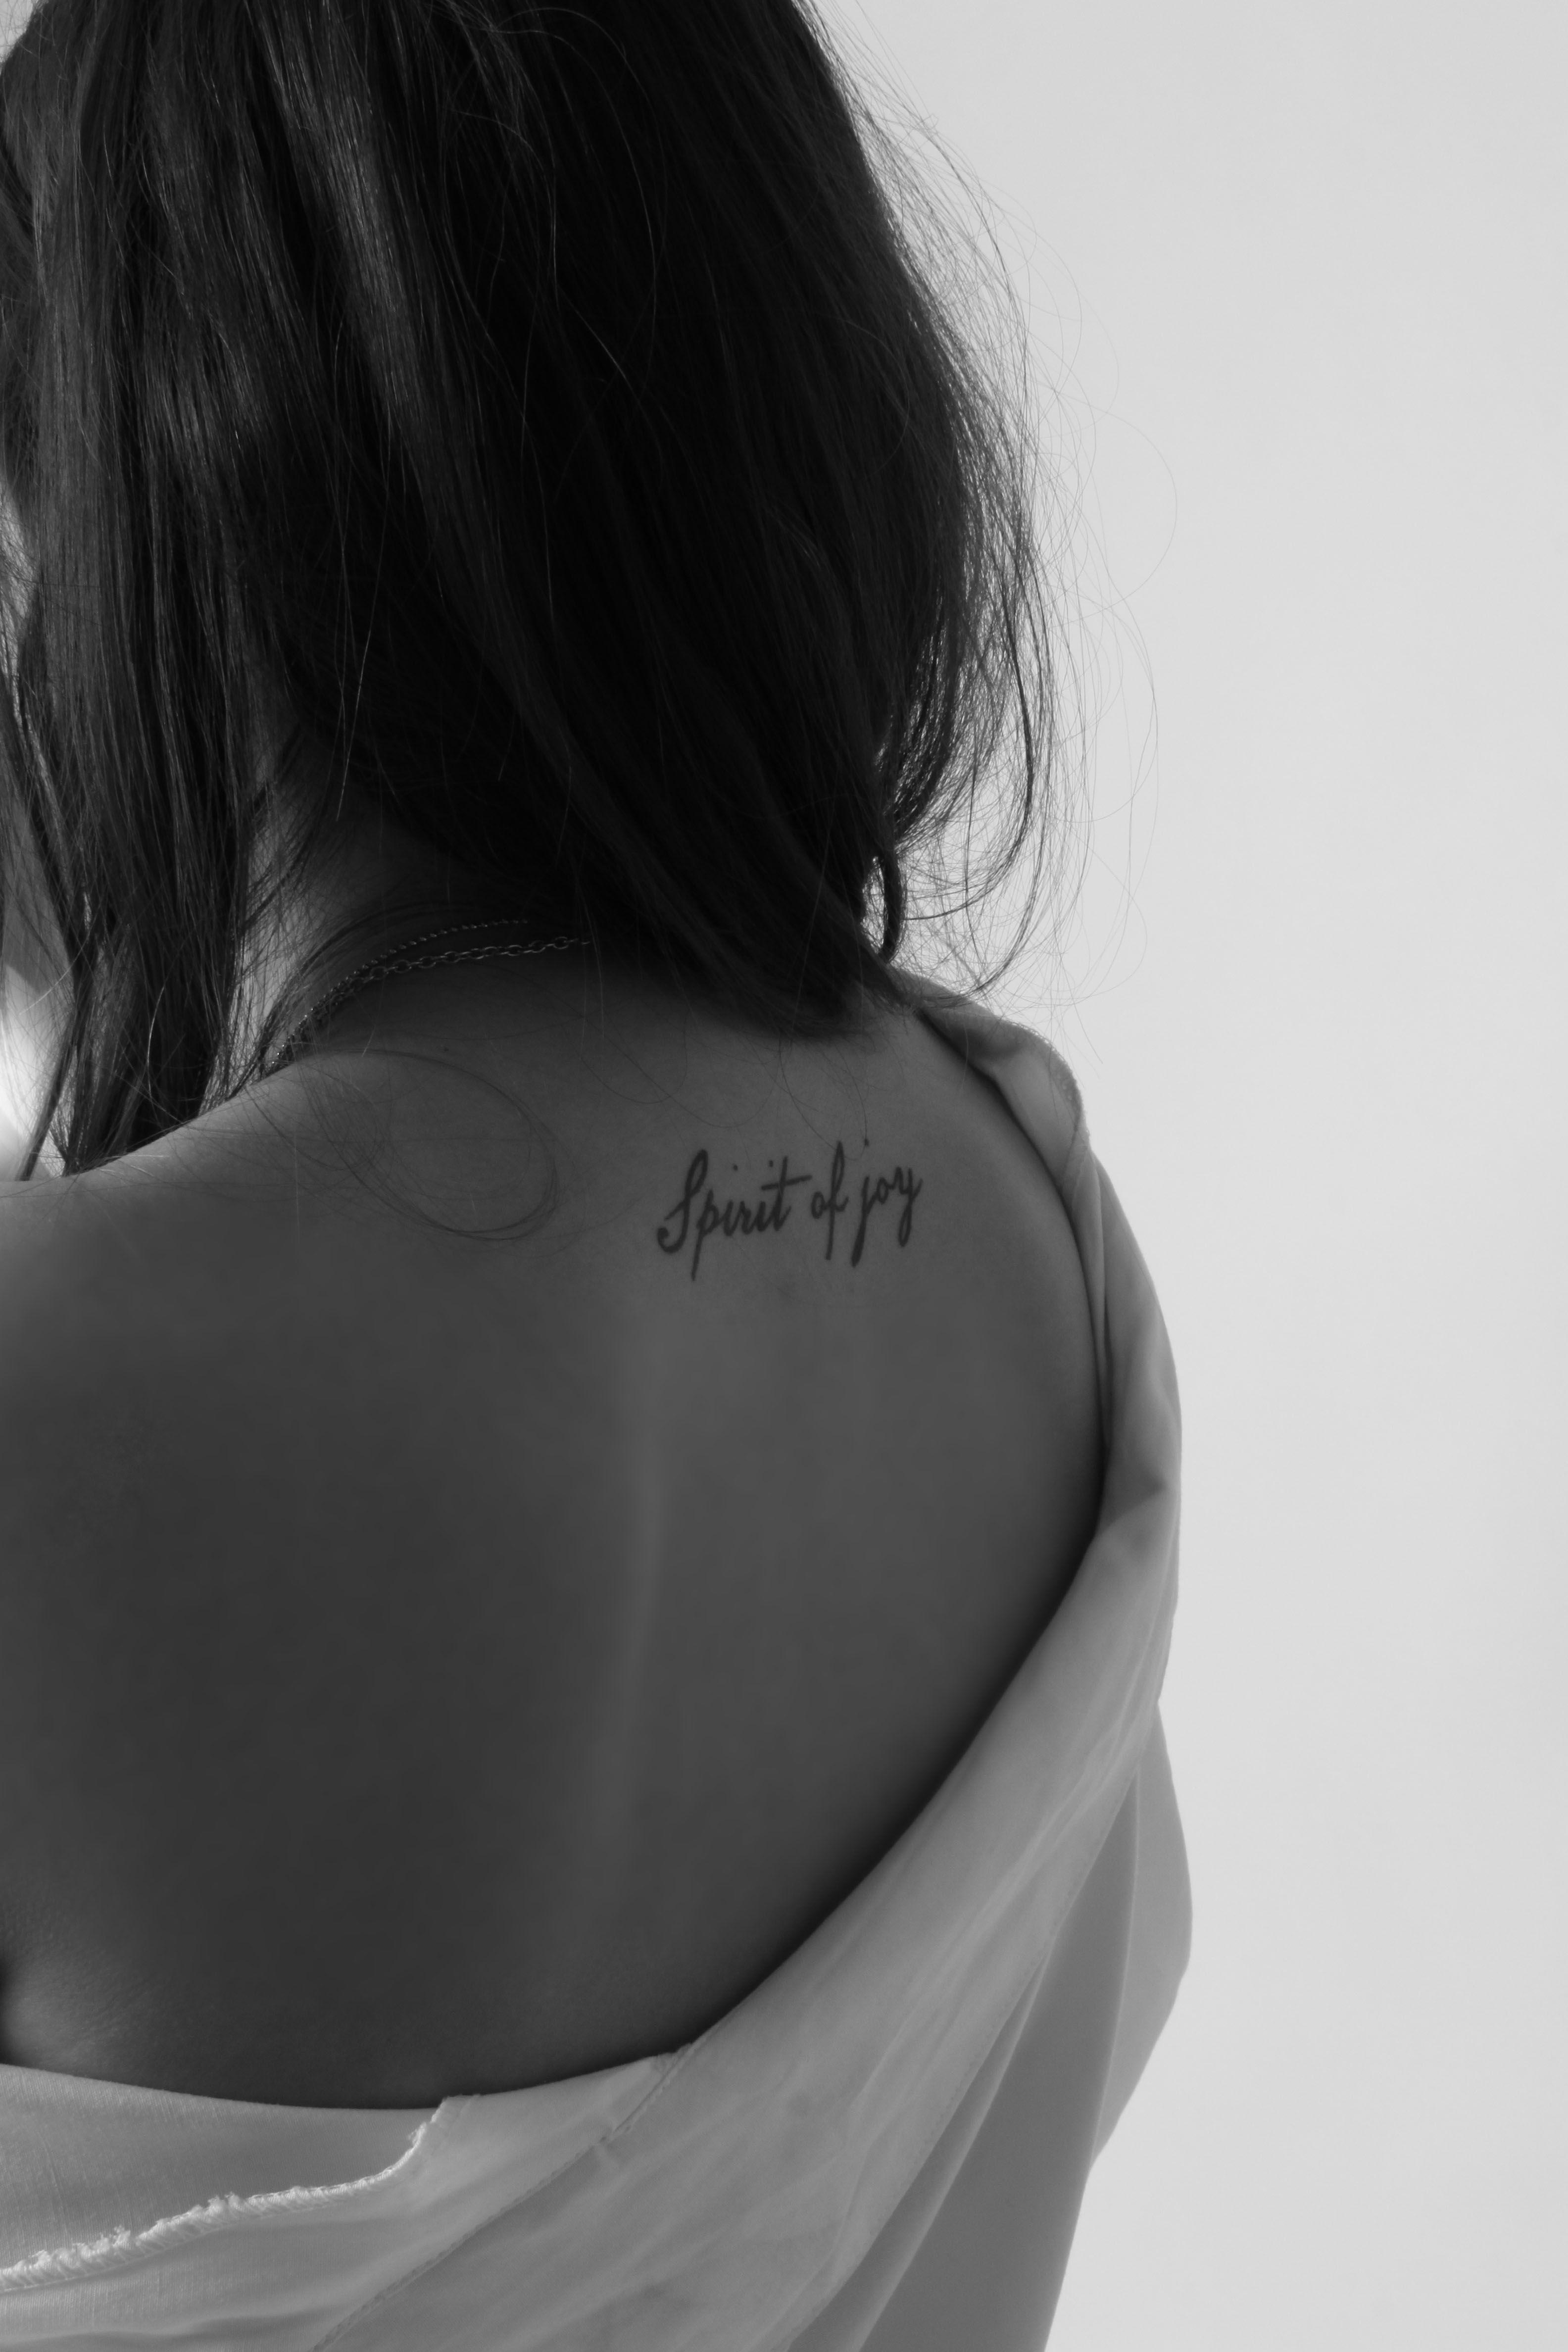 upper back tattoo. Make money pinning! JOIN MY TEAM! Start here: http://www.earnyouronlineincomefast.com